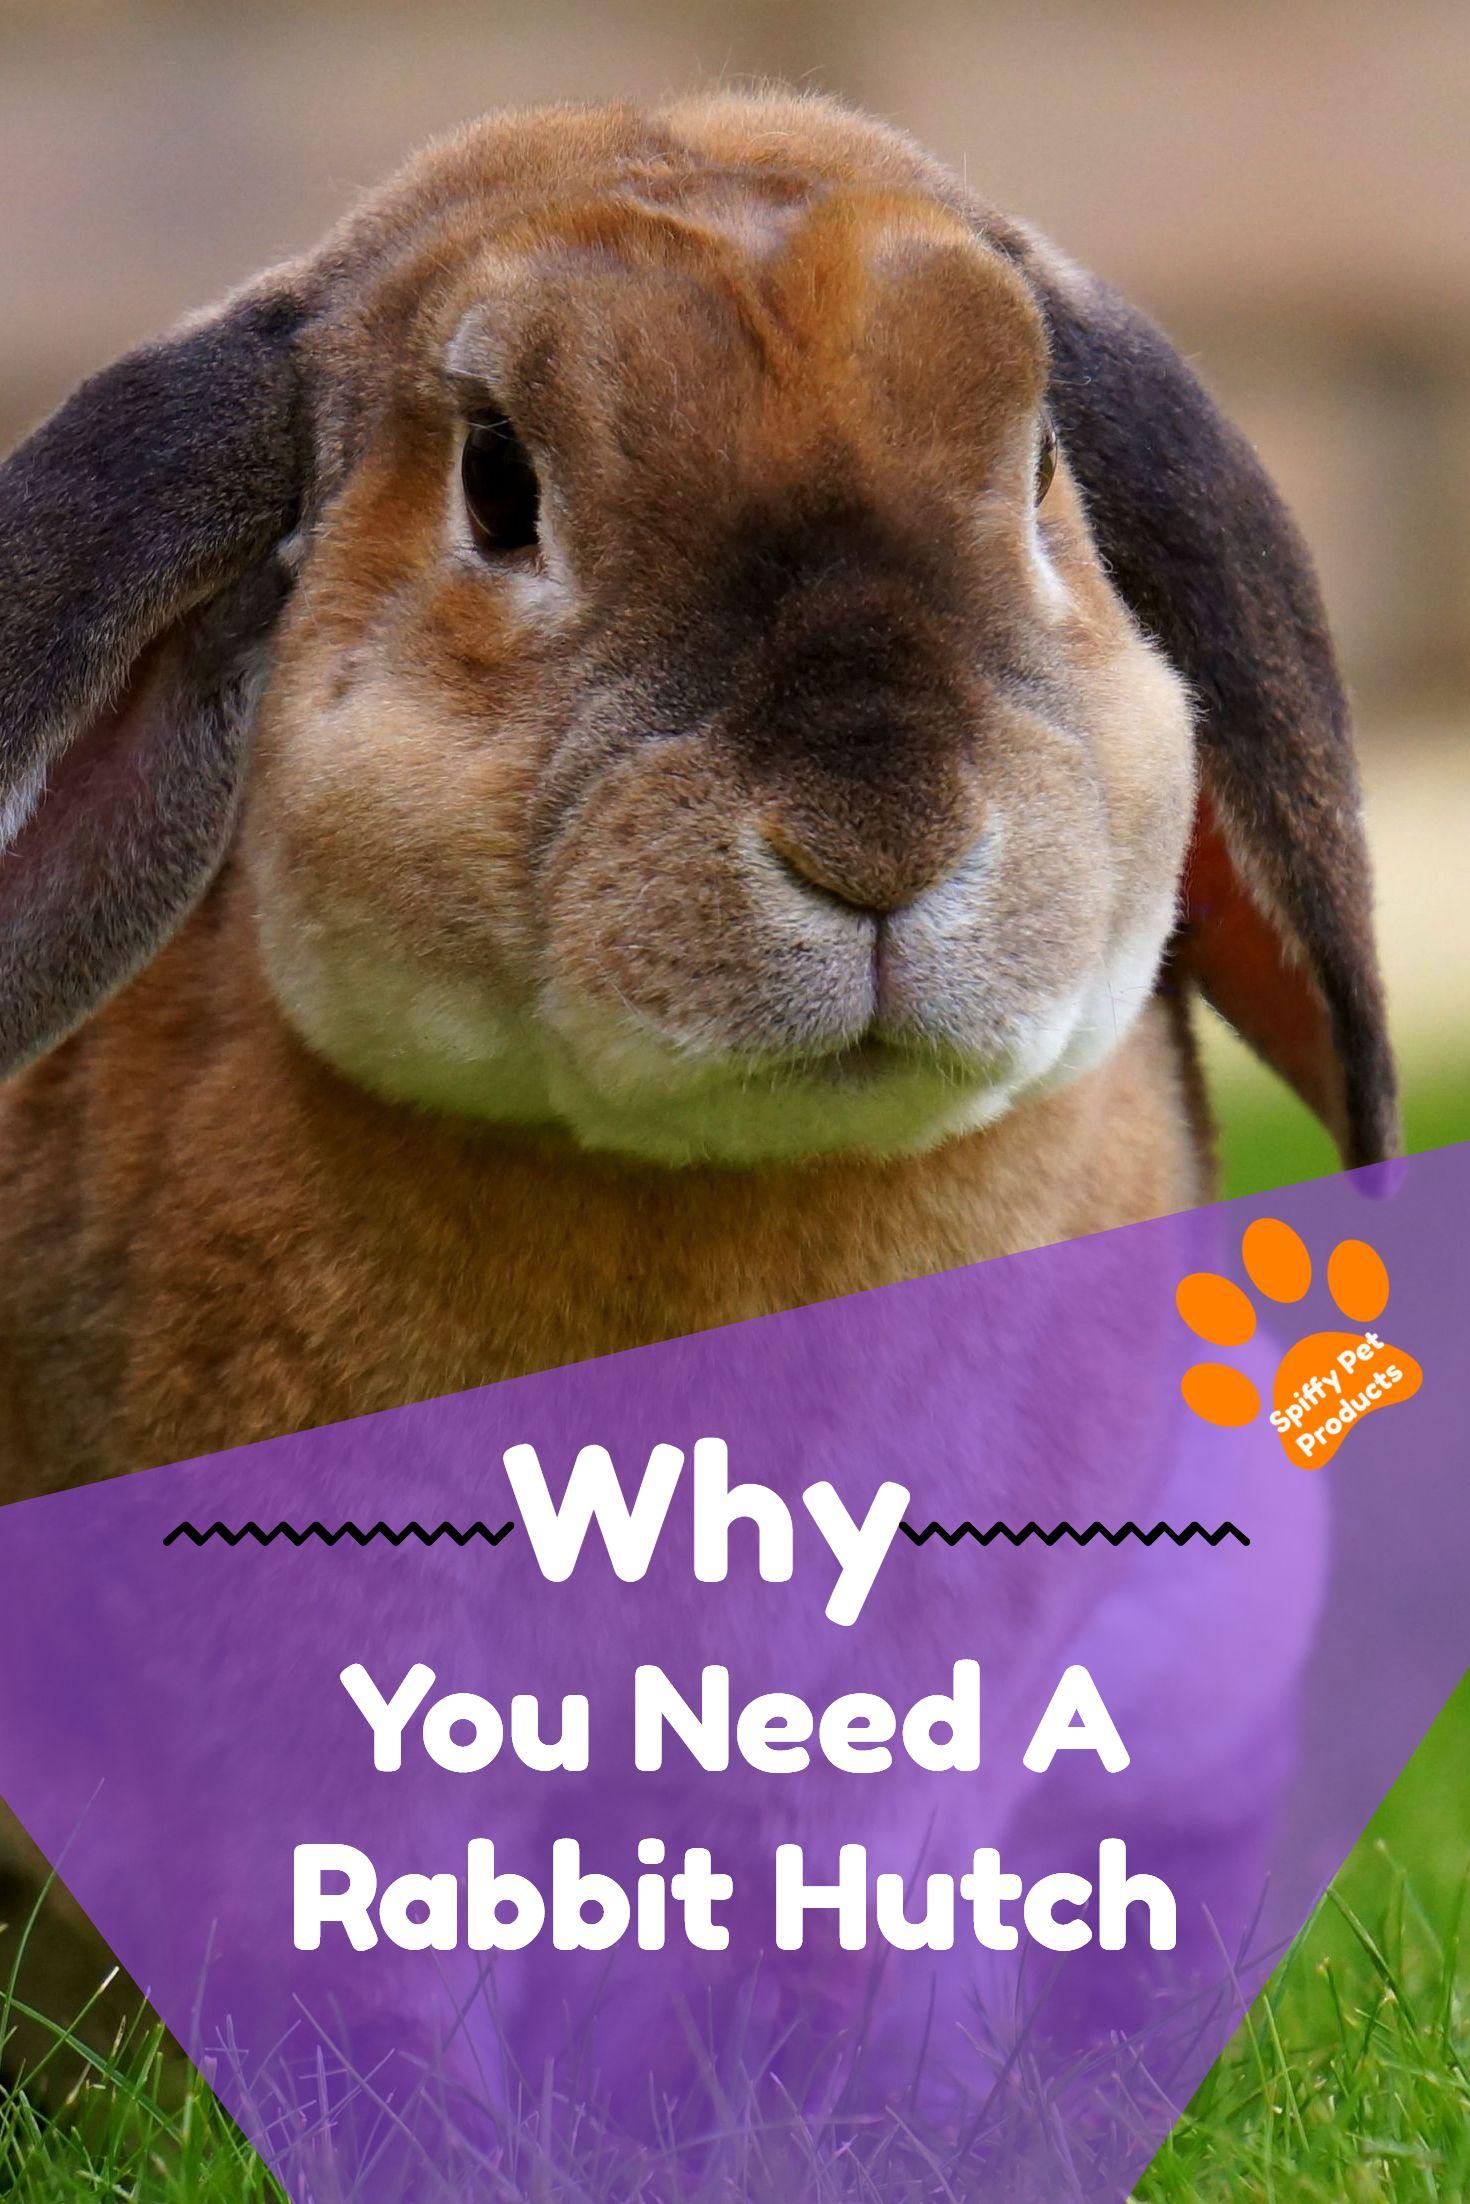 Large Indoor Rabbit Hutch Diy Rabbit Cage Ideas Accessories Top Blogs Pinterest Viral Board Rabbit Hutches Indoor Rabbit Rabbit